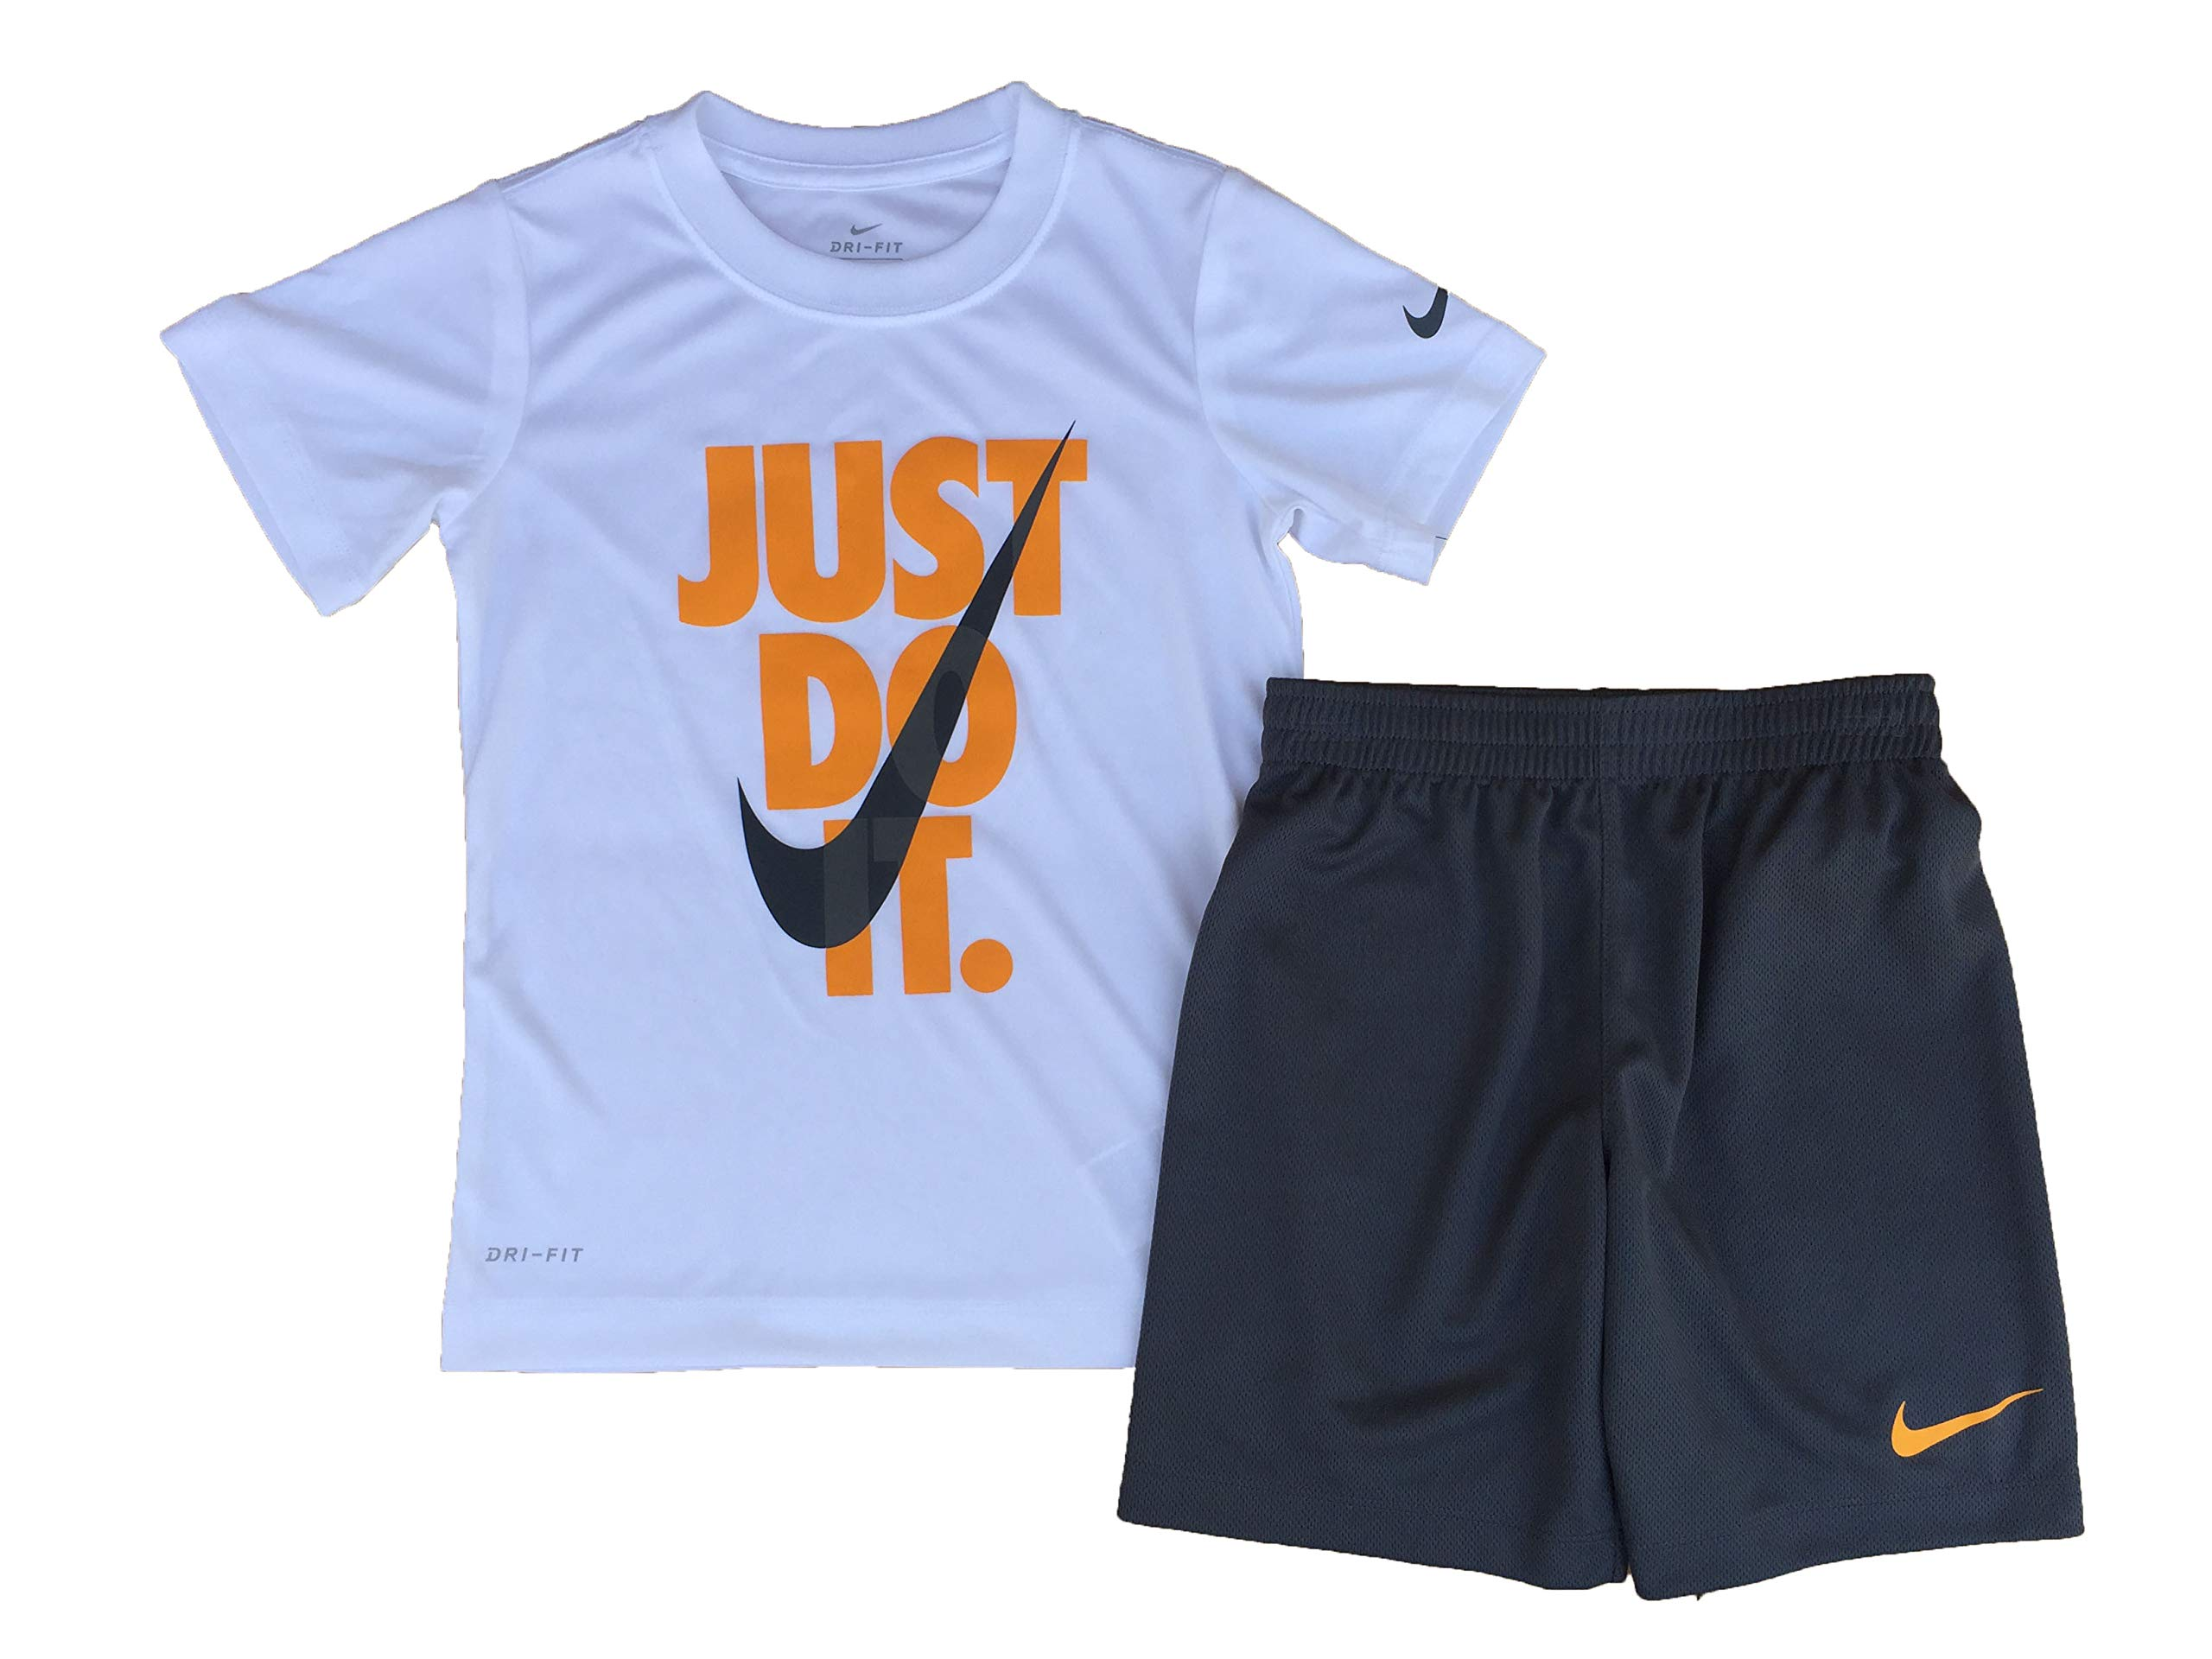 Nike Boy`s Dri-Fit T-Shirt & Shorts 2 Piece Set (White(86F026-G1A)/Yellow, 6)